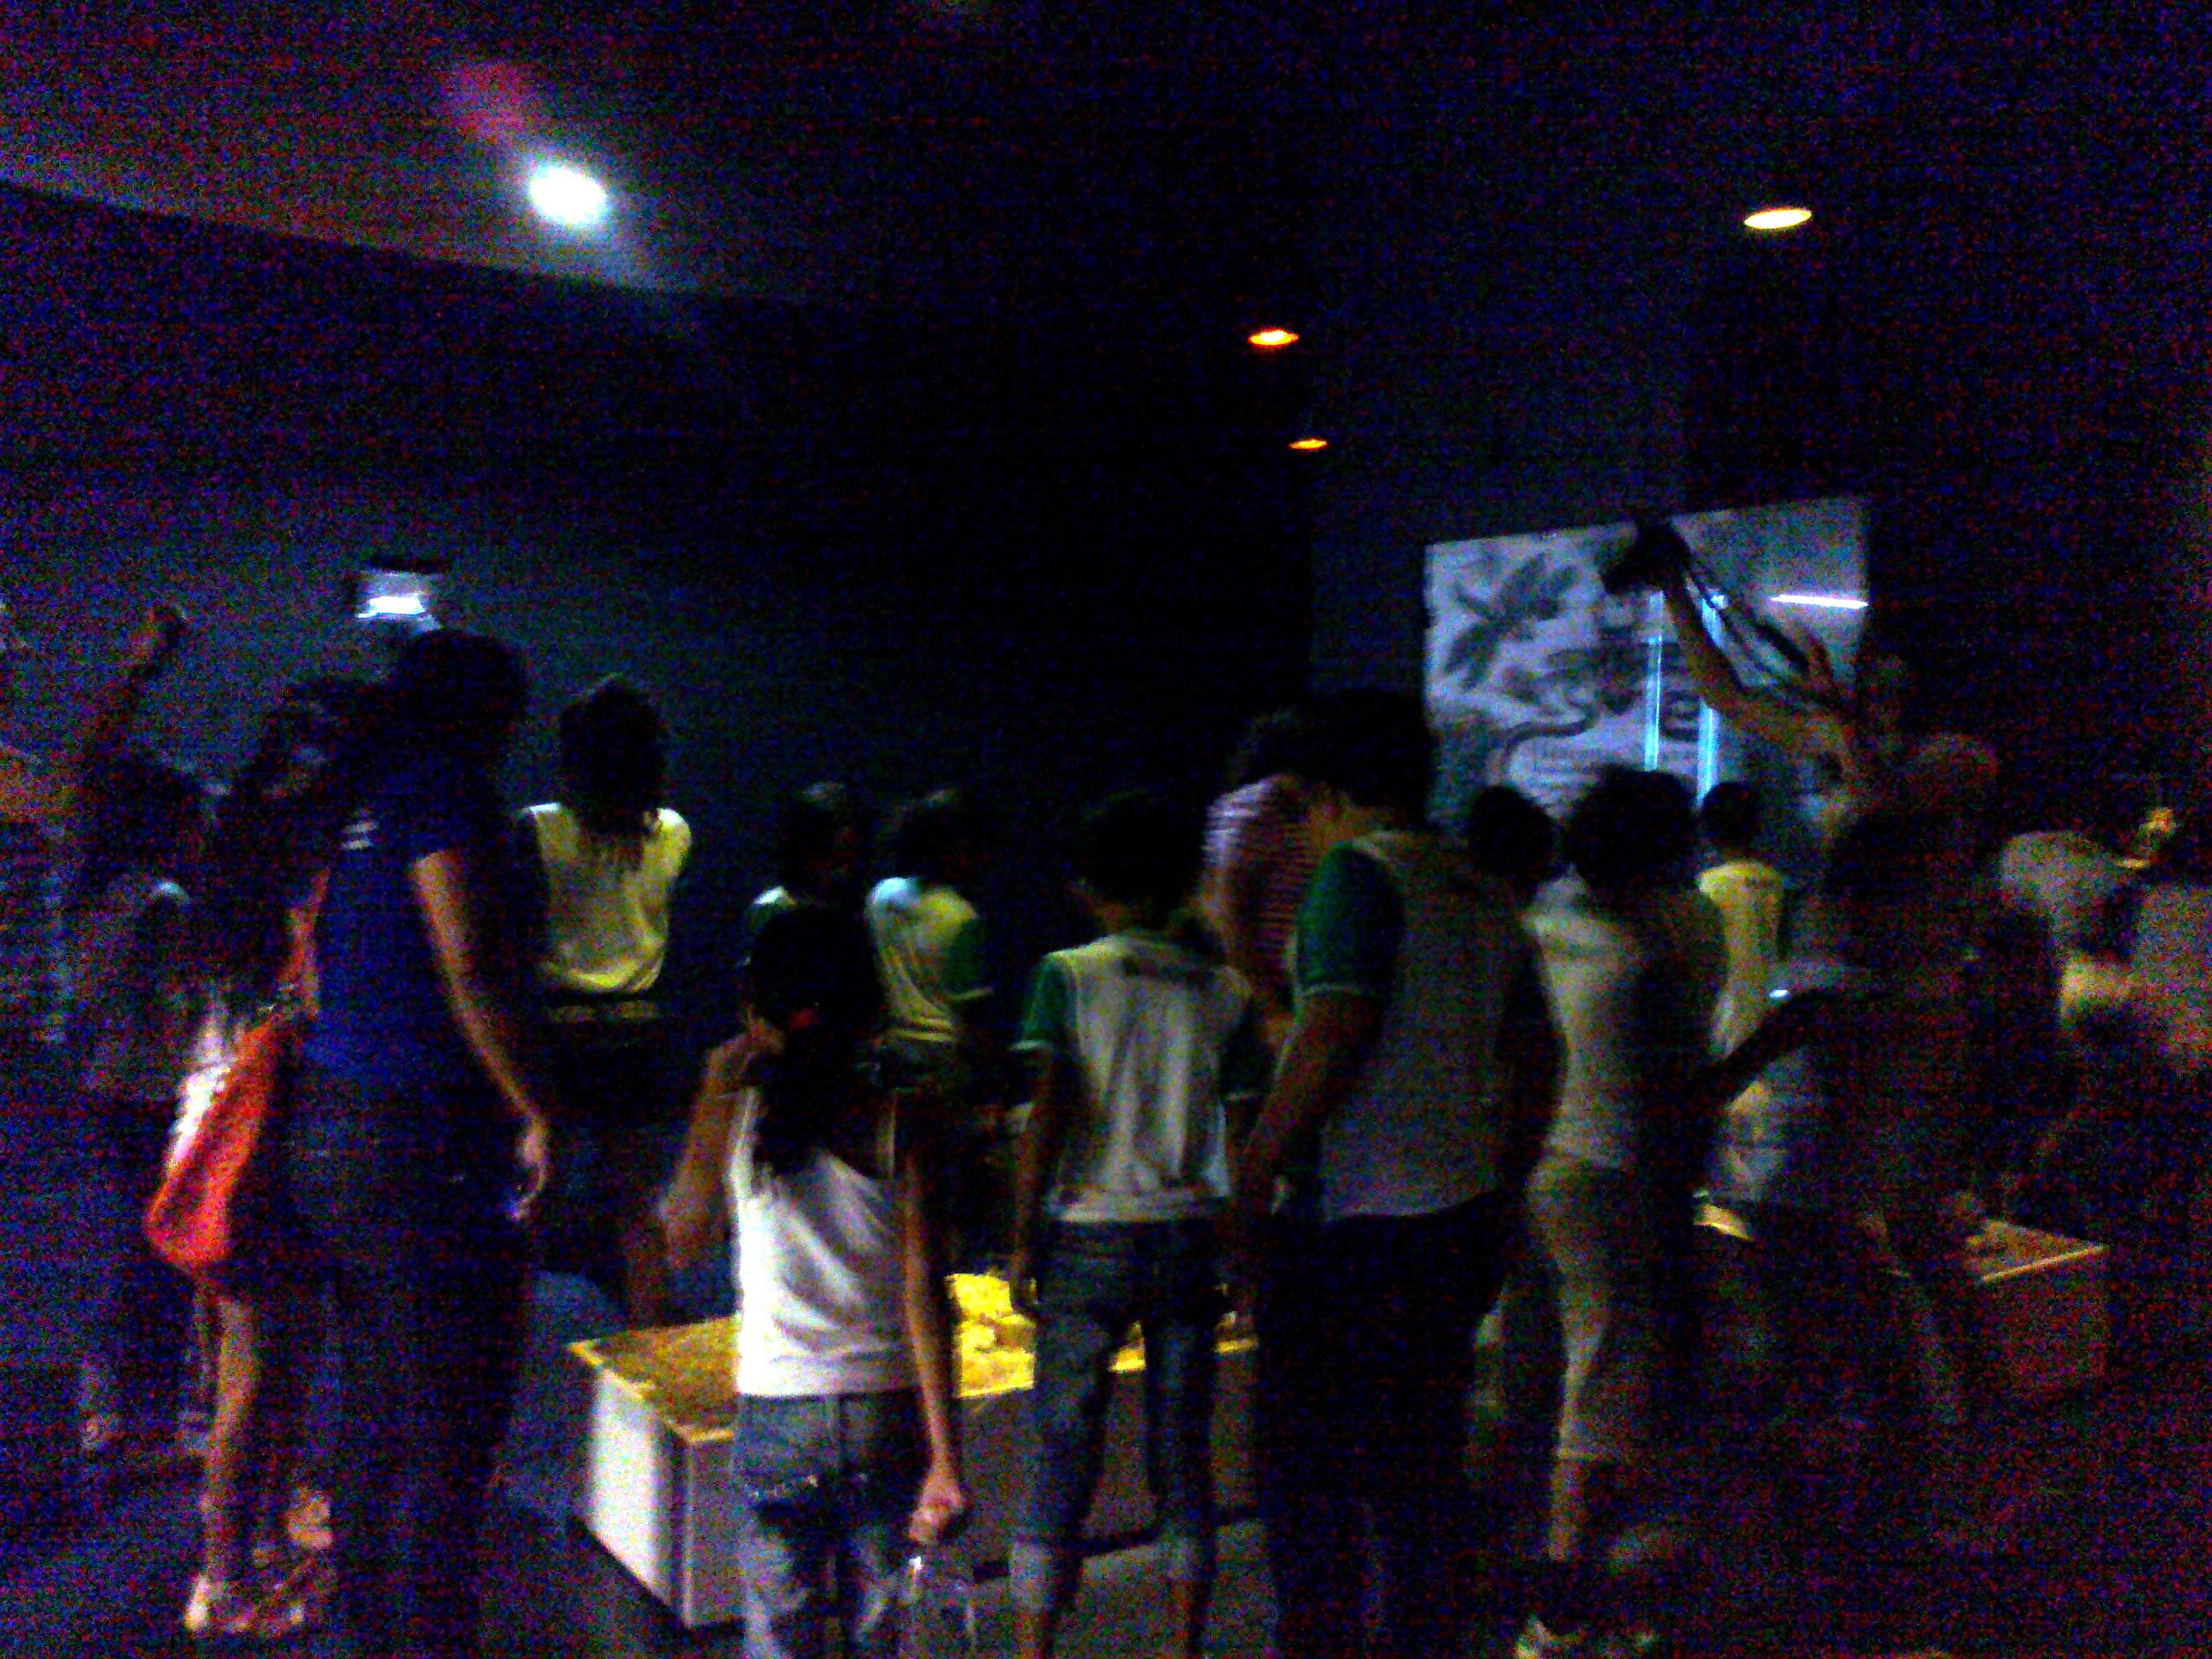 Visita ao CEMAFAUNA pela Escola Maria Soledade Alves, Juazeiro-BA - 22.11.13